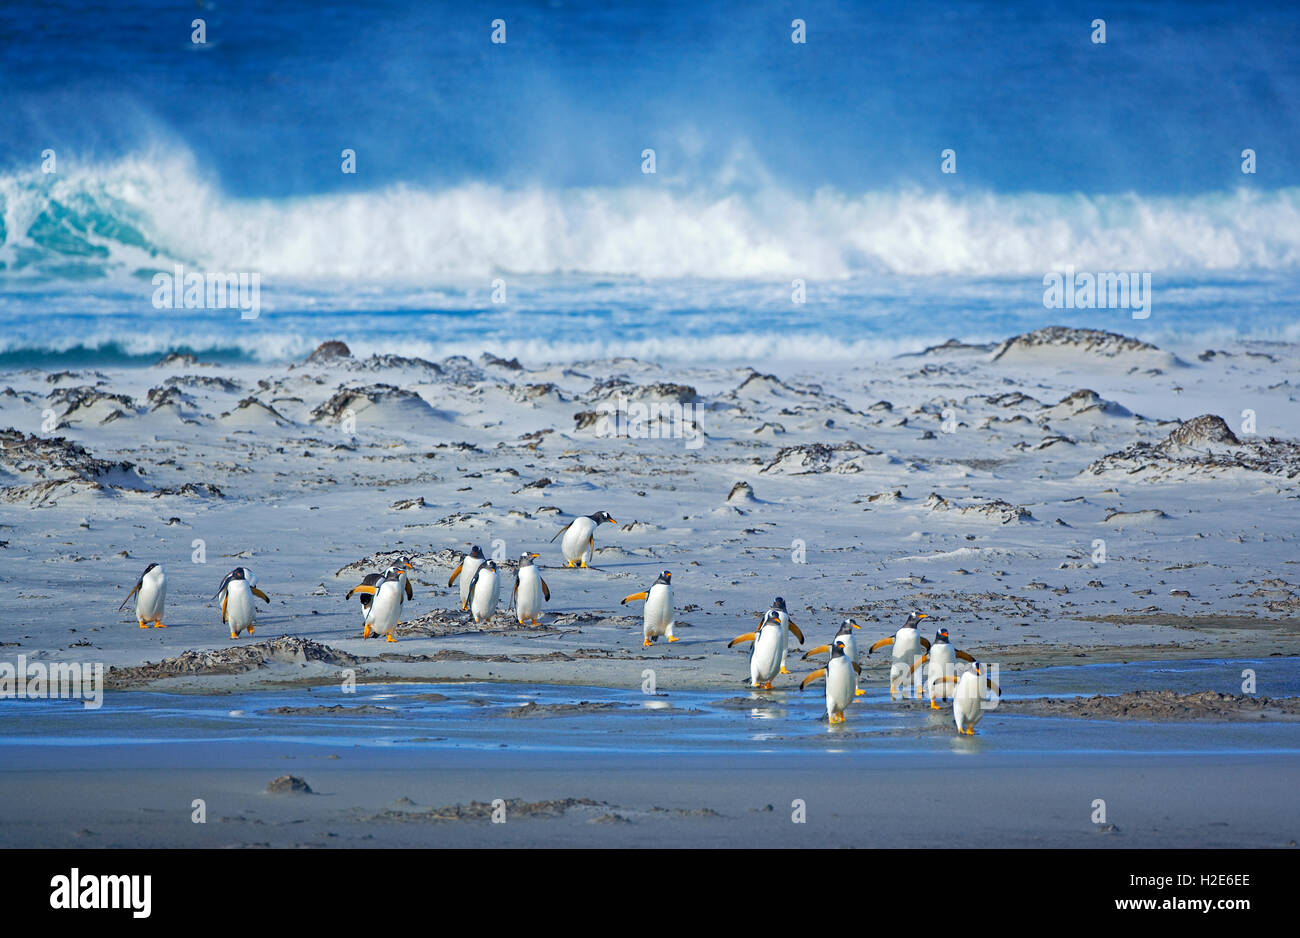 Gentoo Penguins (Pygoscelis papua papua), colony walking on beach, Falkland Islands, South Atlantic - Stock Image